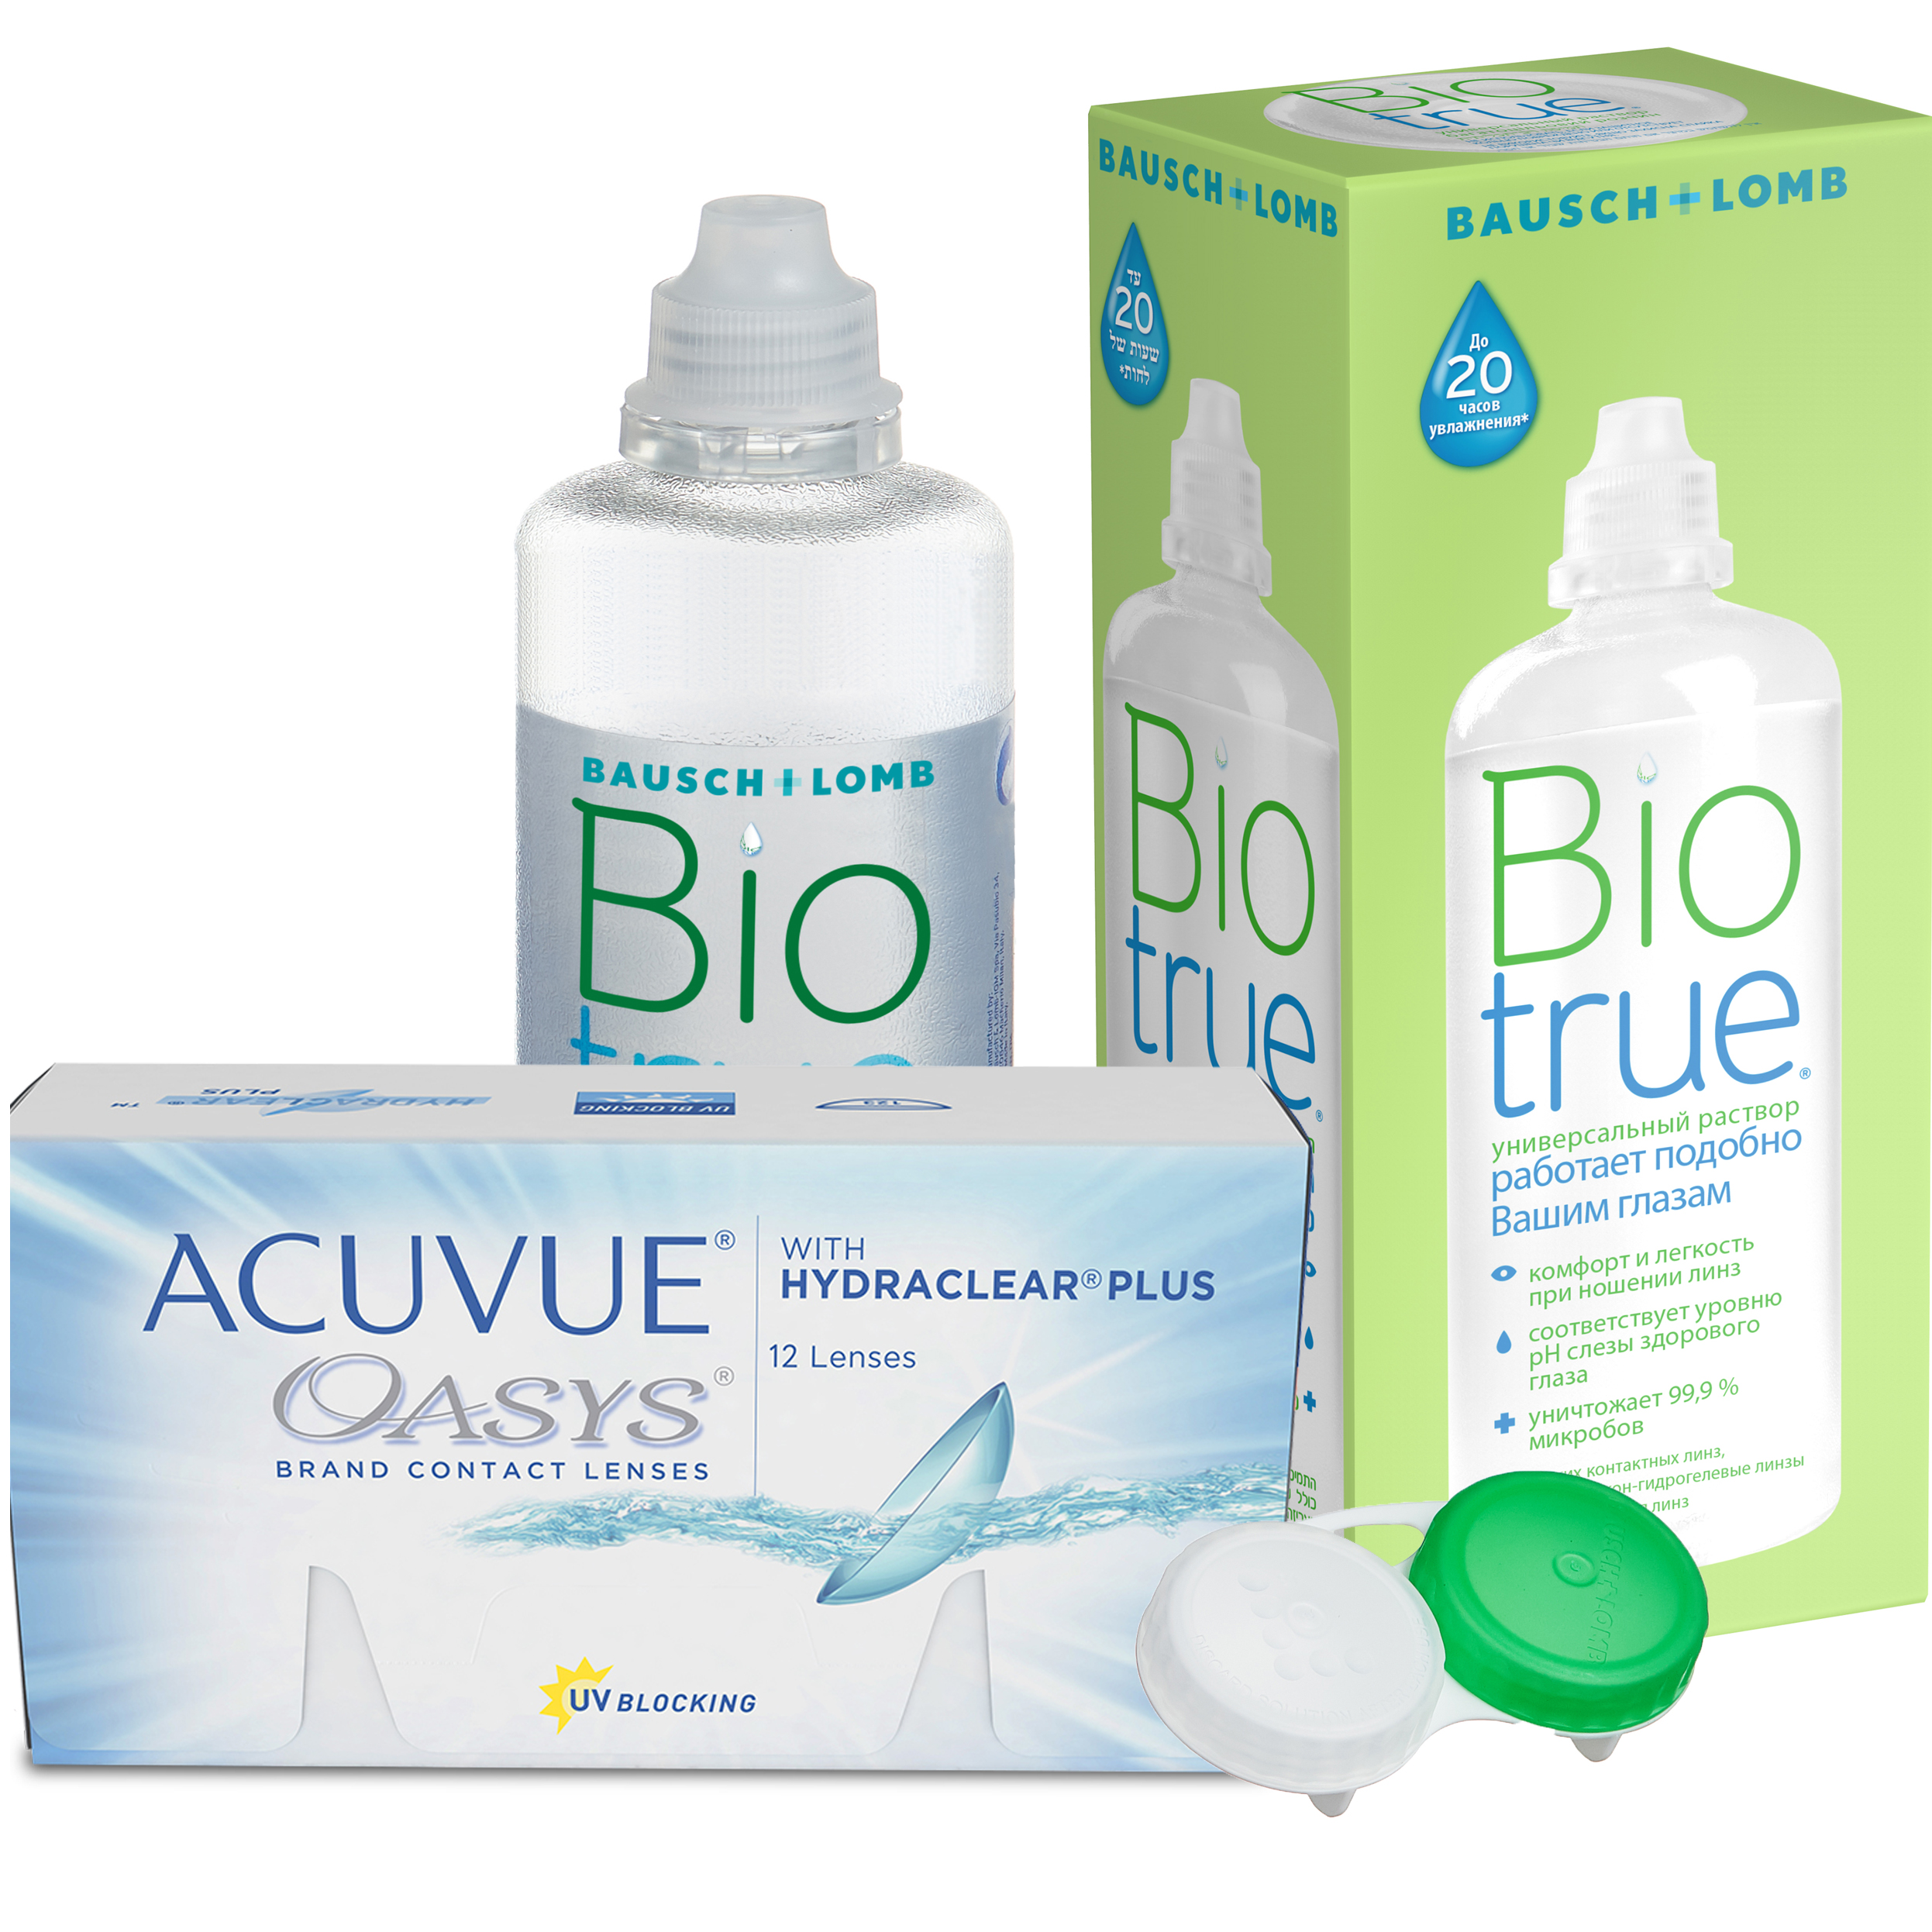 Купить Oasys with Hydraclear Plus 12 линз + Biotrue, Контактные линзы Acuvue Oasys with Hydraclear Plus 12 линз R 8.8 -5, 00 + Biotrue 300 мл